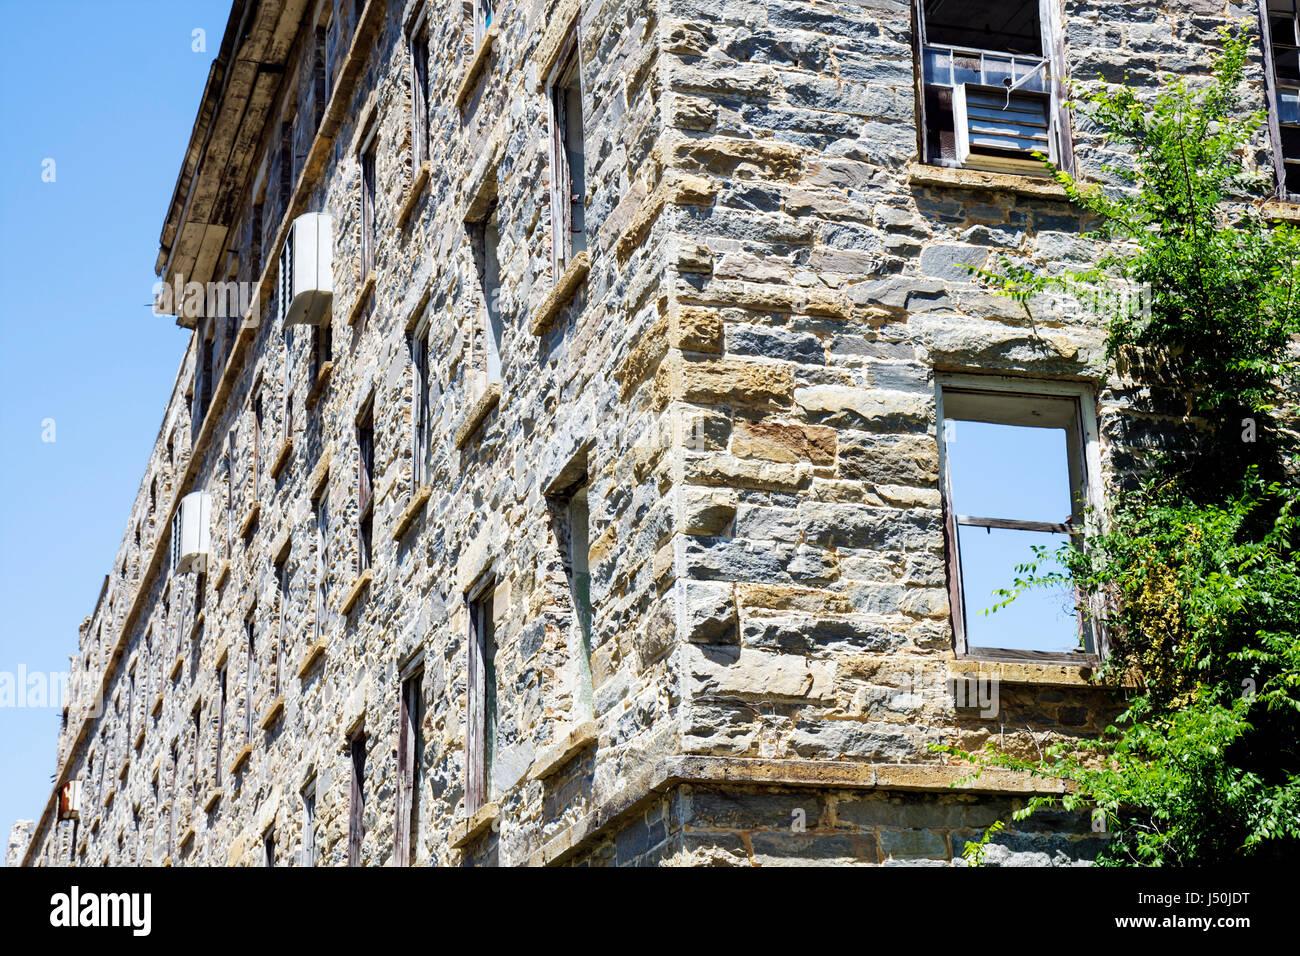 Alabama Tallasee mill ruins stone walls historic preservation textile factory 1852 Confederate uniforms Civil War - Stock Image